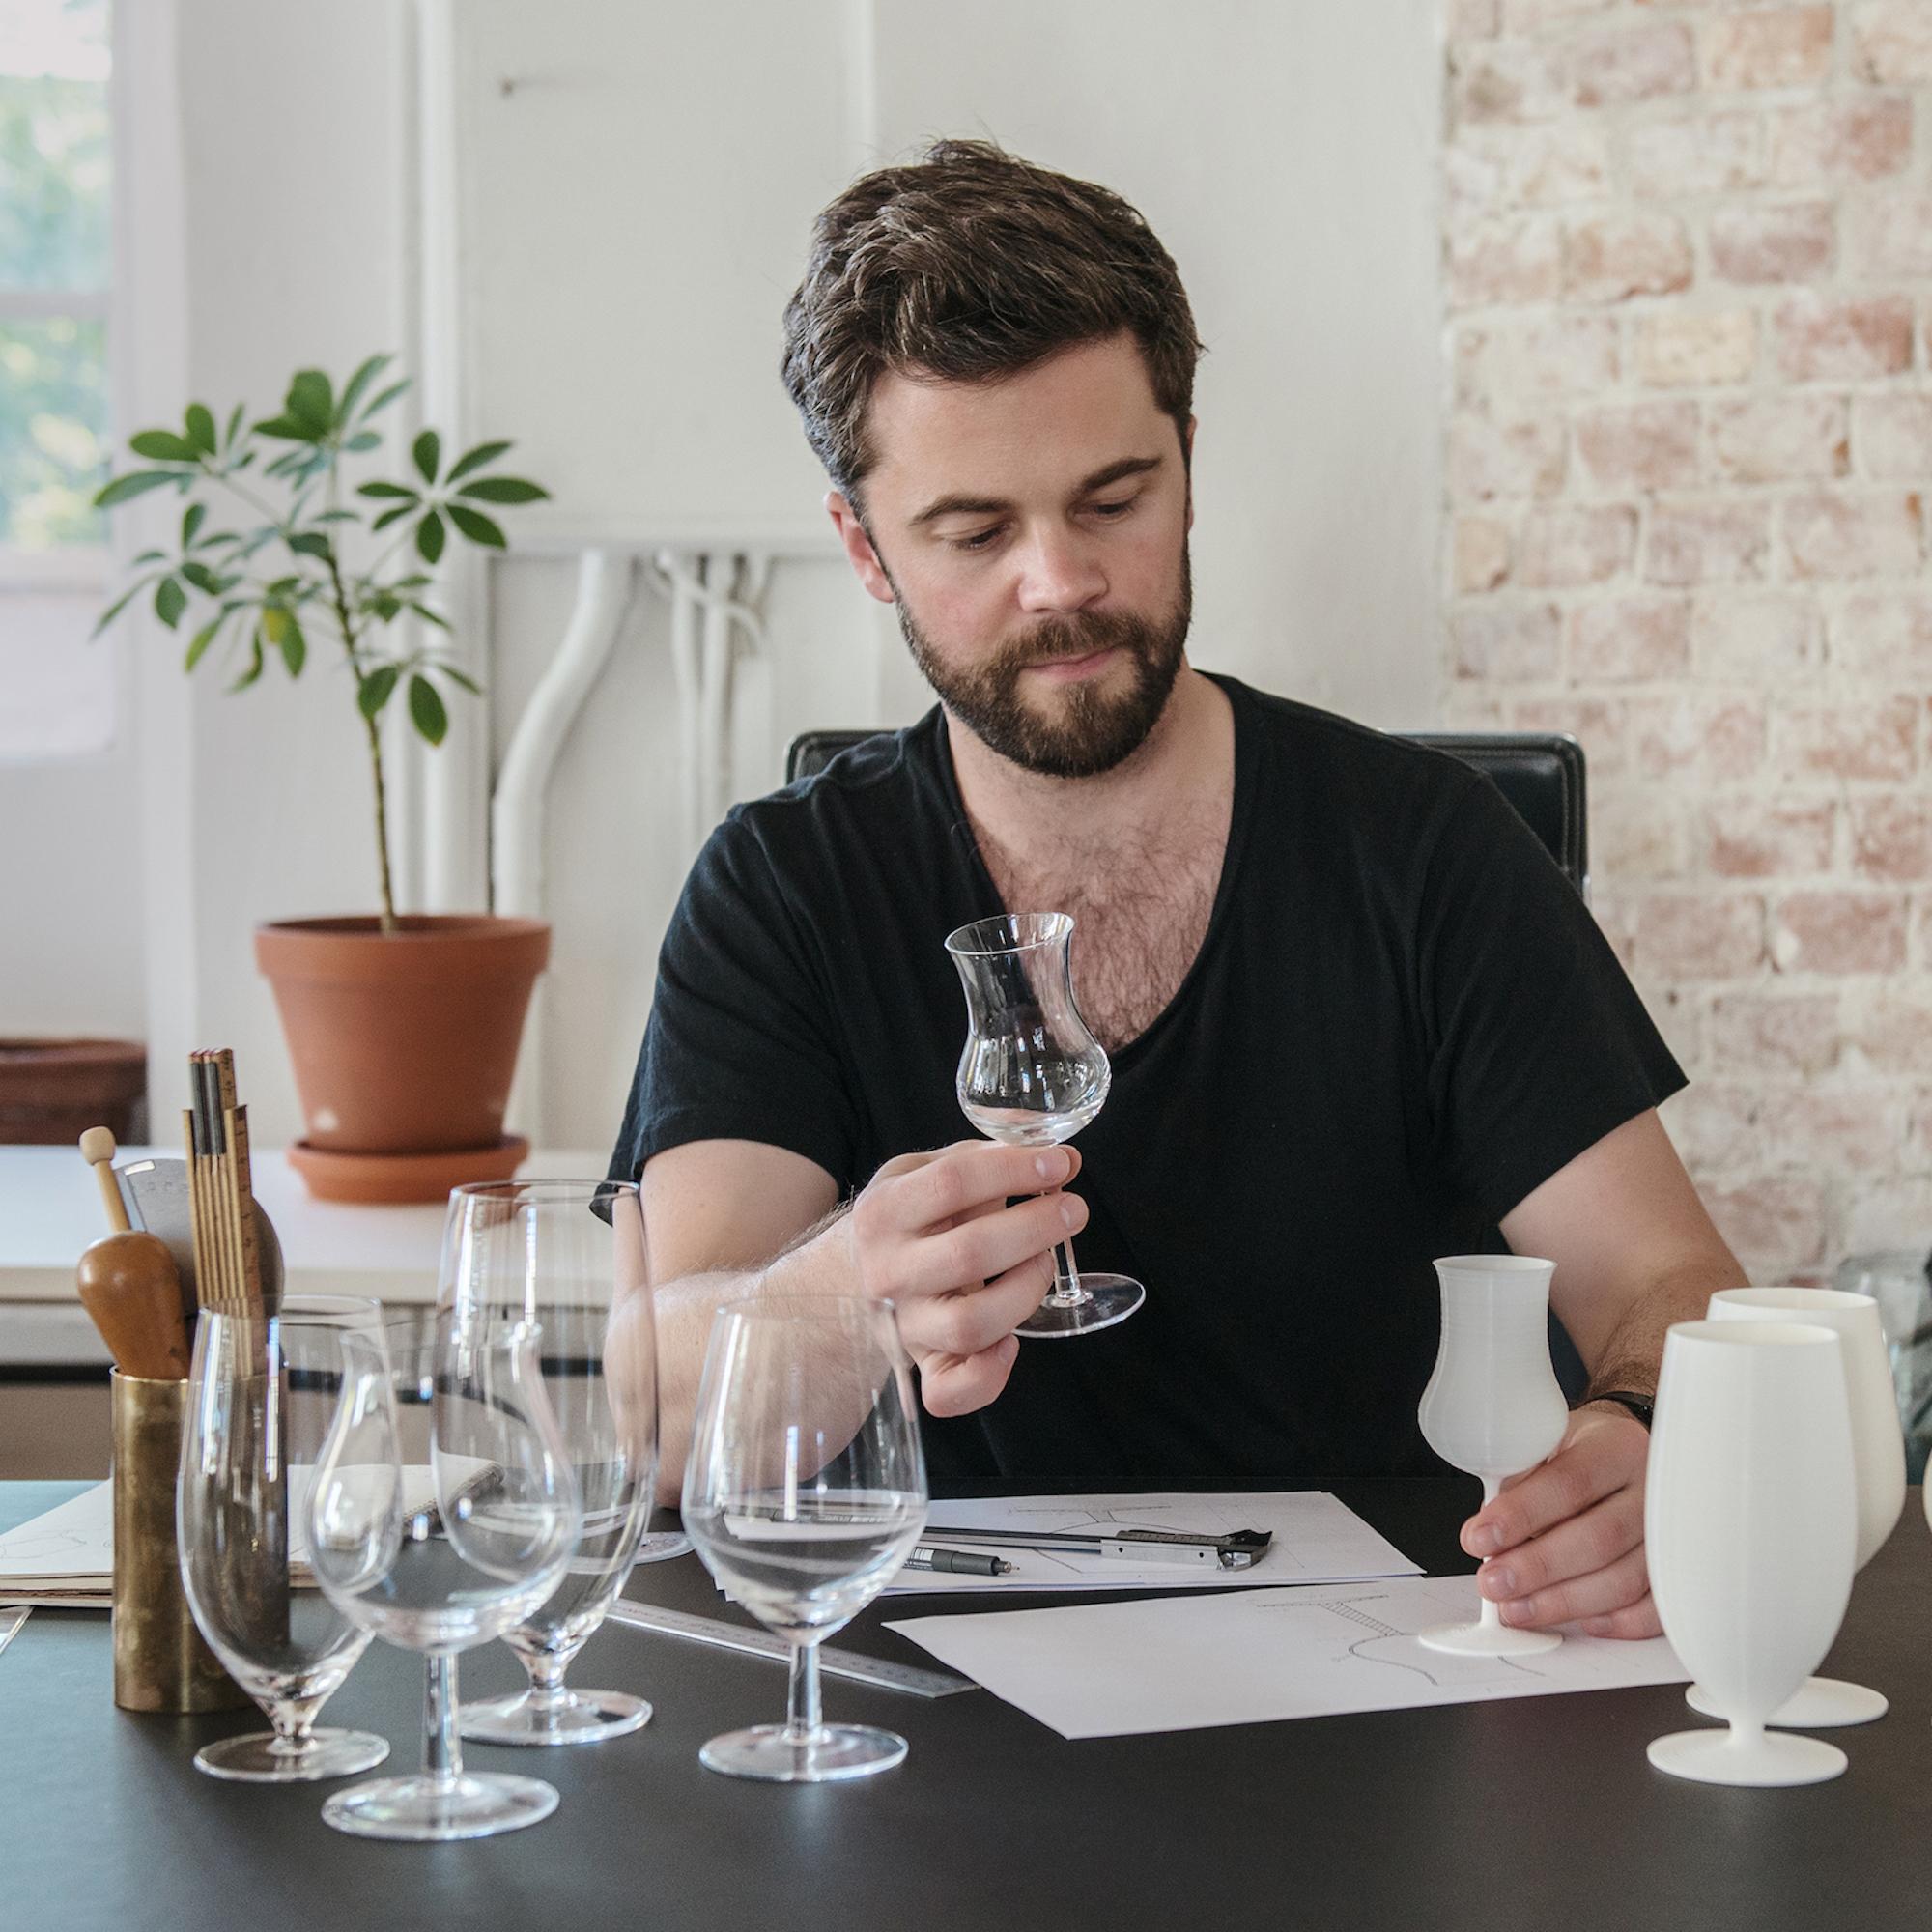 Mann sitter ved et bord og betrakter glass i ulike former. Foto.